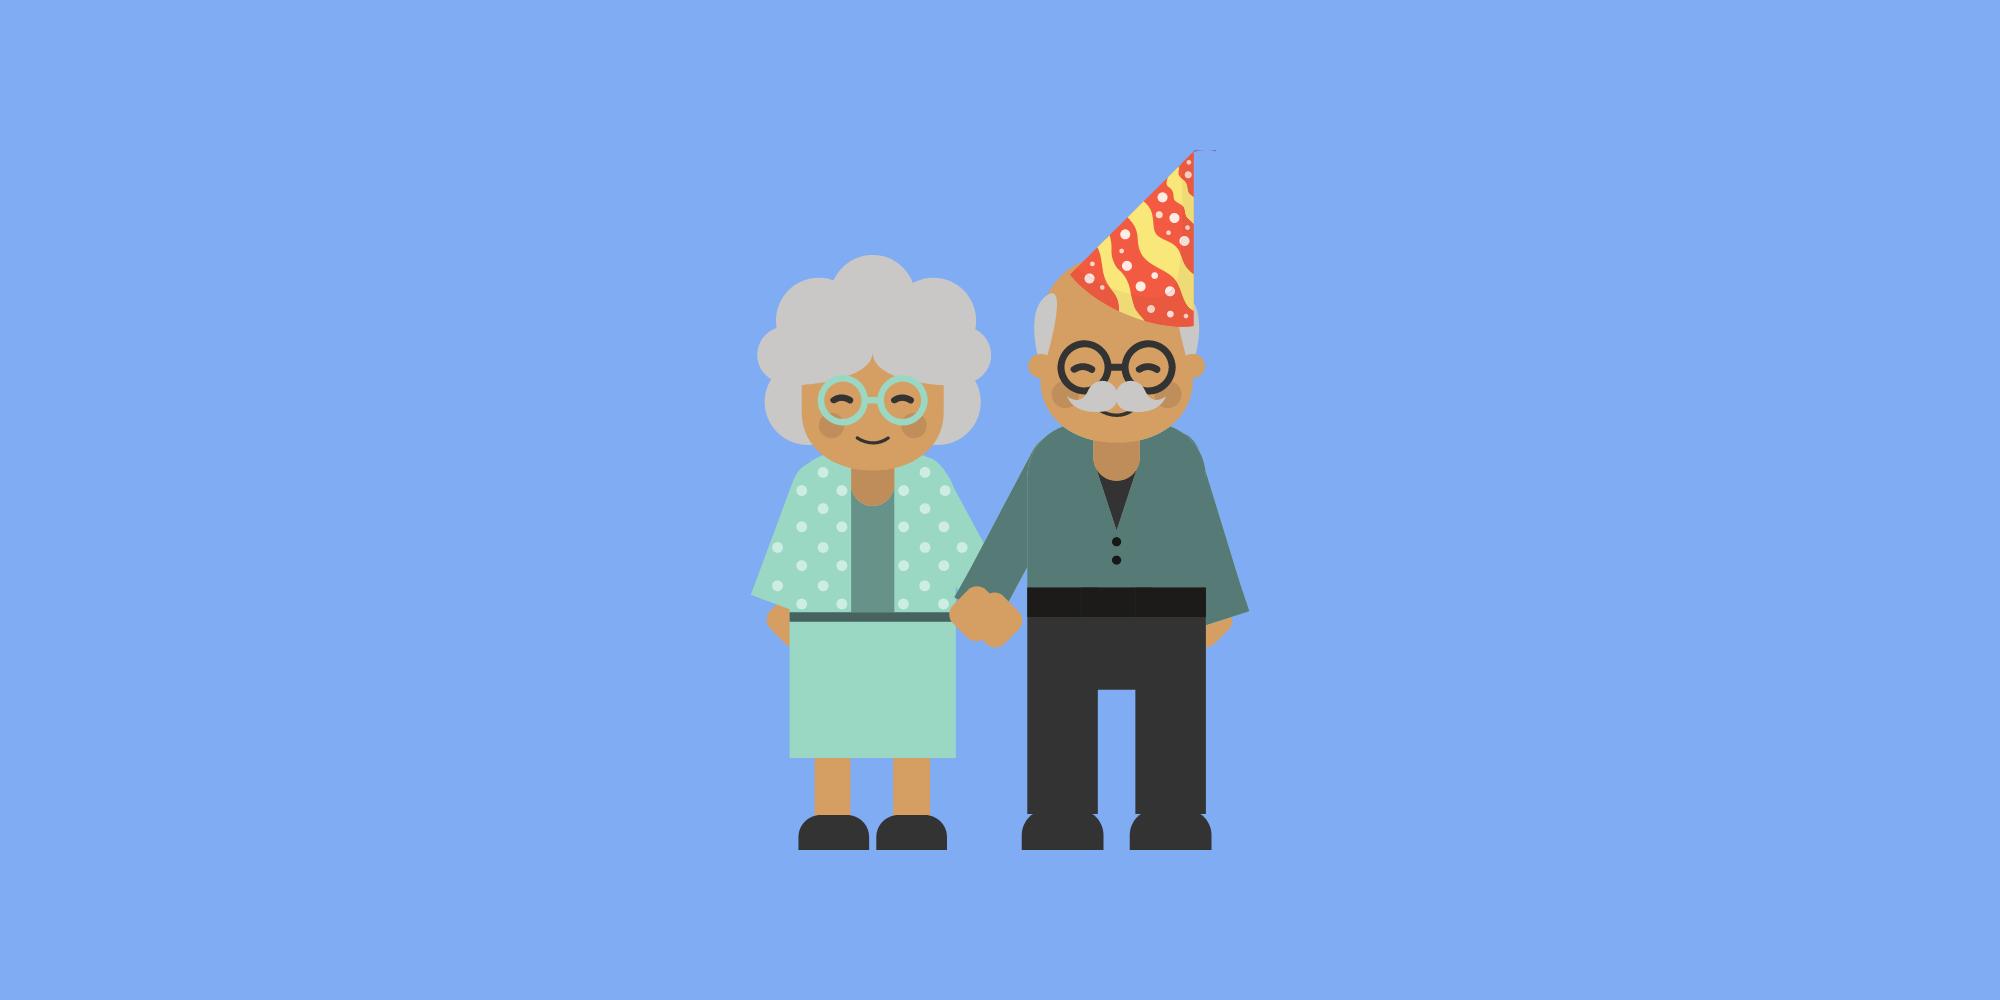 80th-birthday-gifts